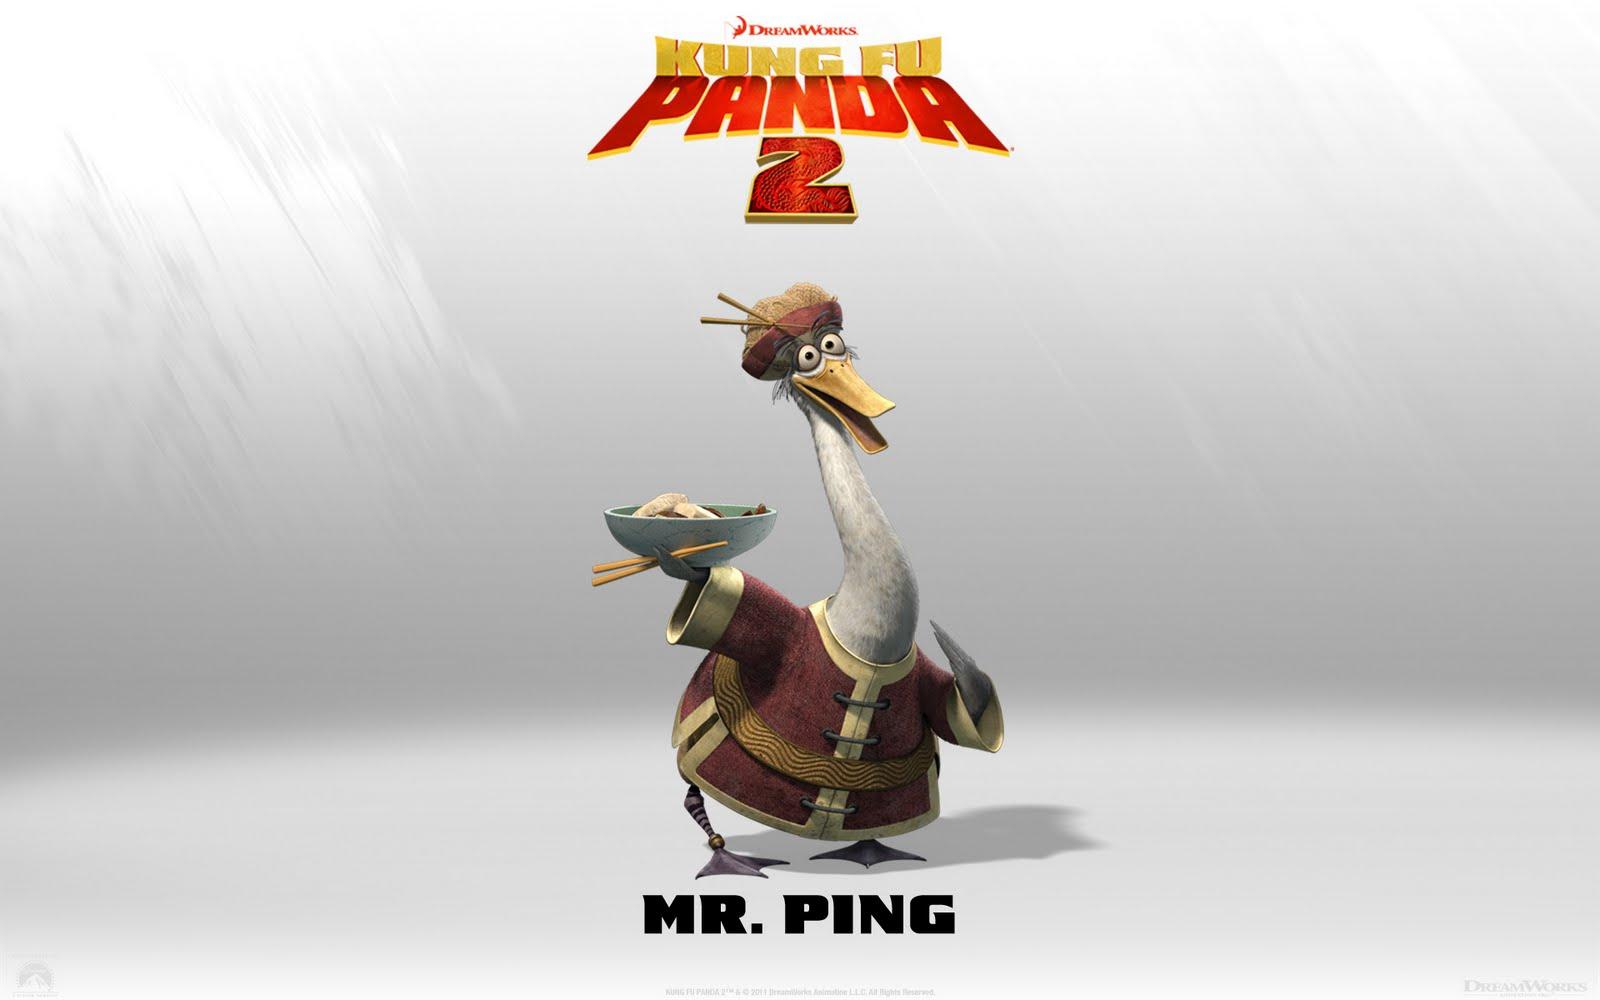 http://1.bp.blogspot.com/-lWyj3Z4wKKQ/TeD_aS01WtI/AAAAAAAAA1c/r027mOy8VE8/s1600/Kung-Fu-Panda-2-Mr-Ping-HD-Wallpaper.jpg